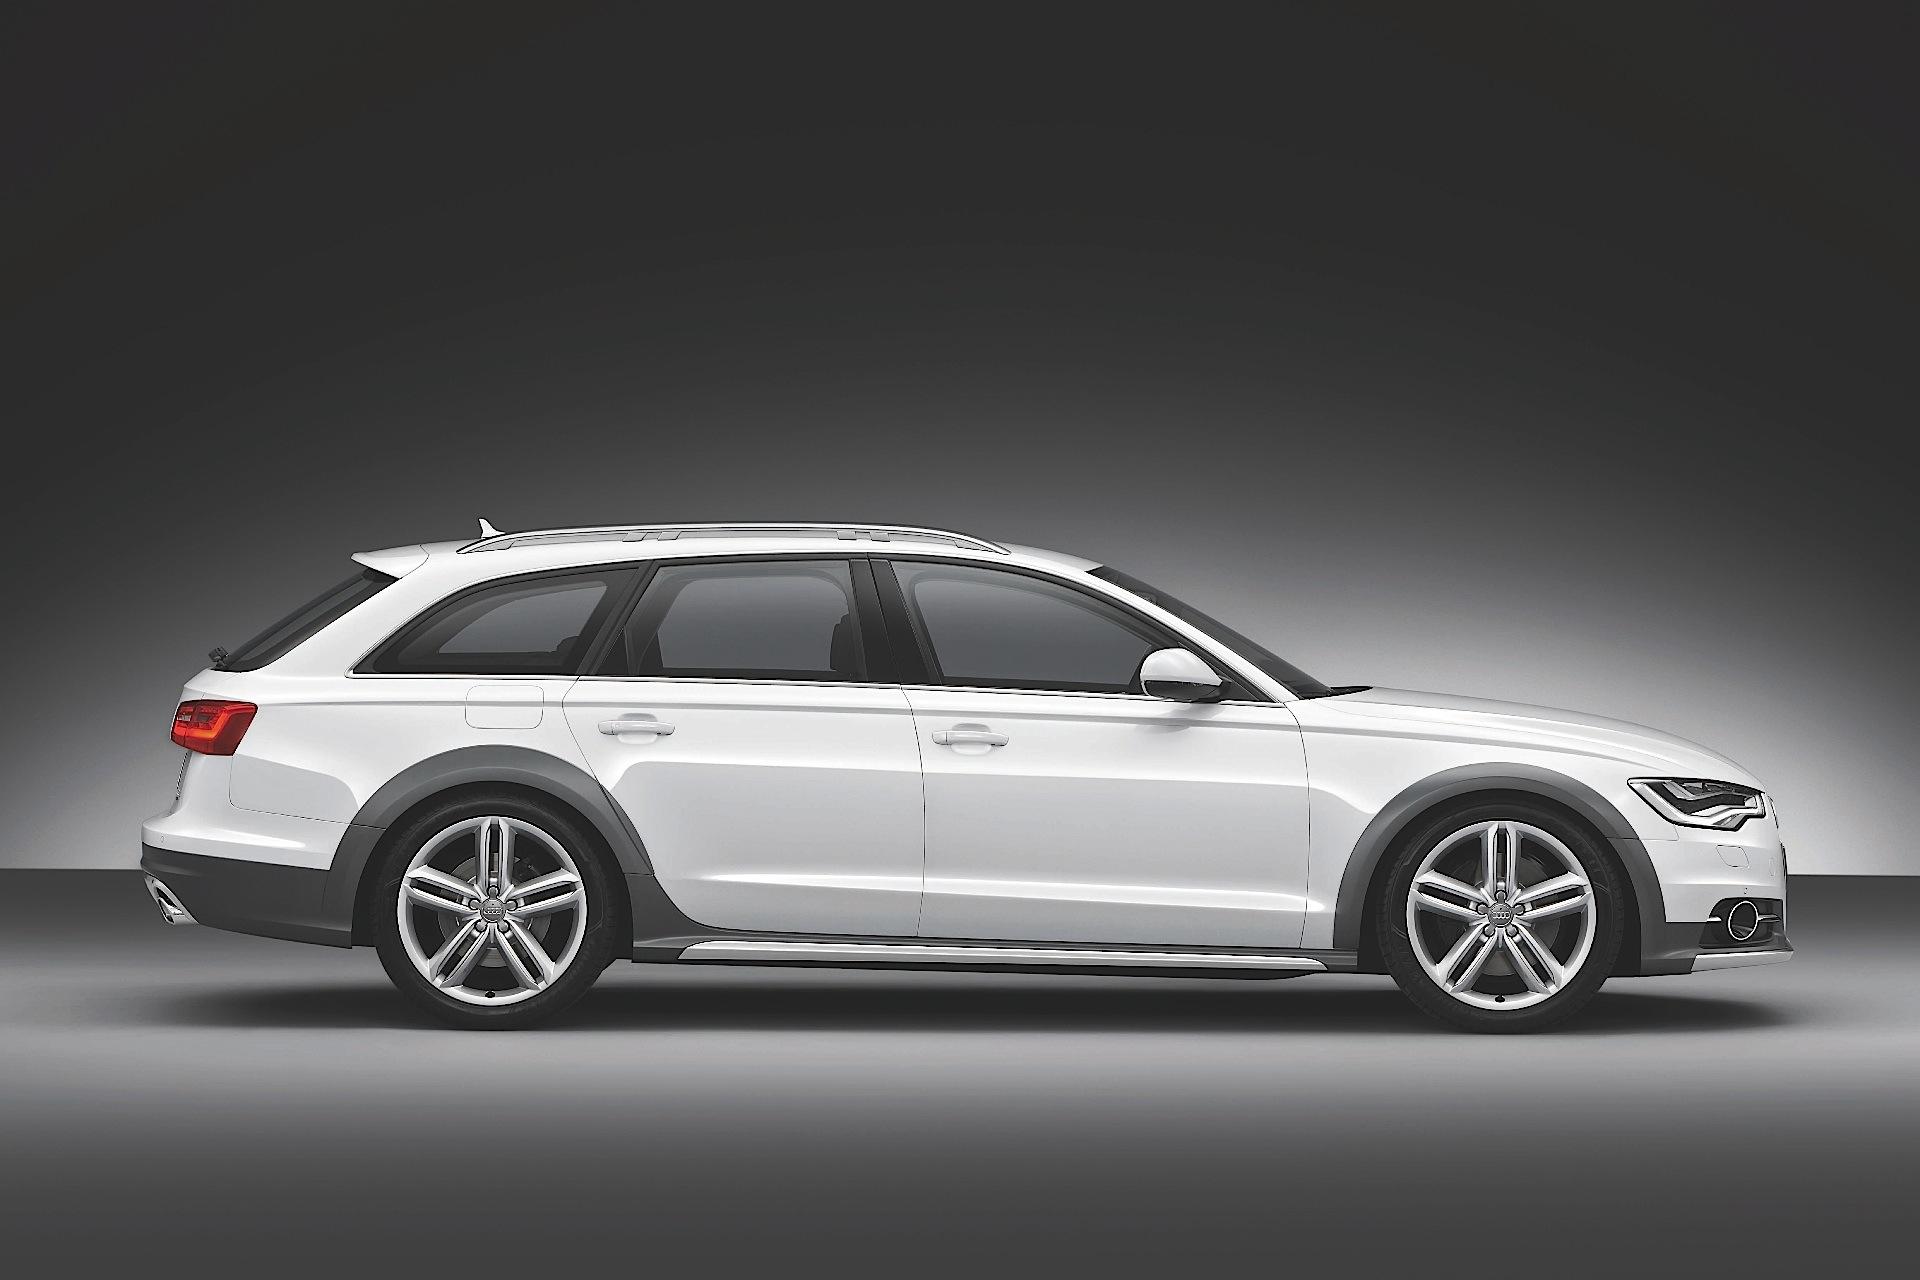 Kelebihan Kekurangan Audi Allroad 2018 Review